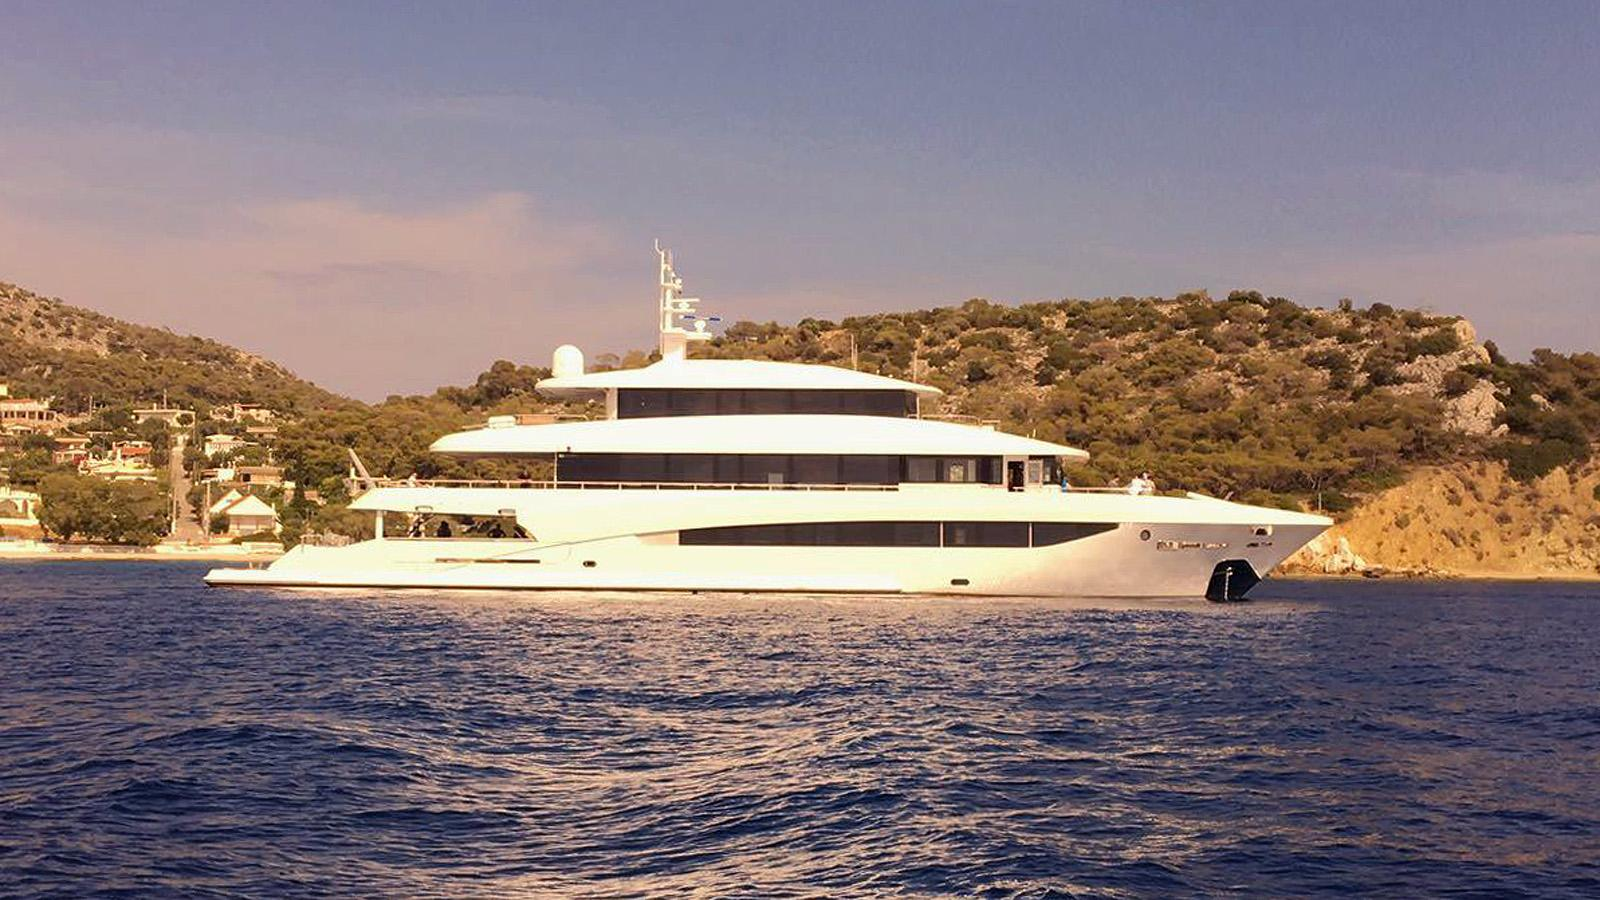 my eden motoryacht golden yachts 45m 2017 profile